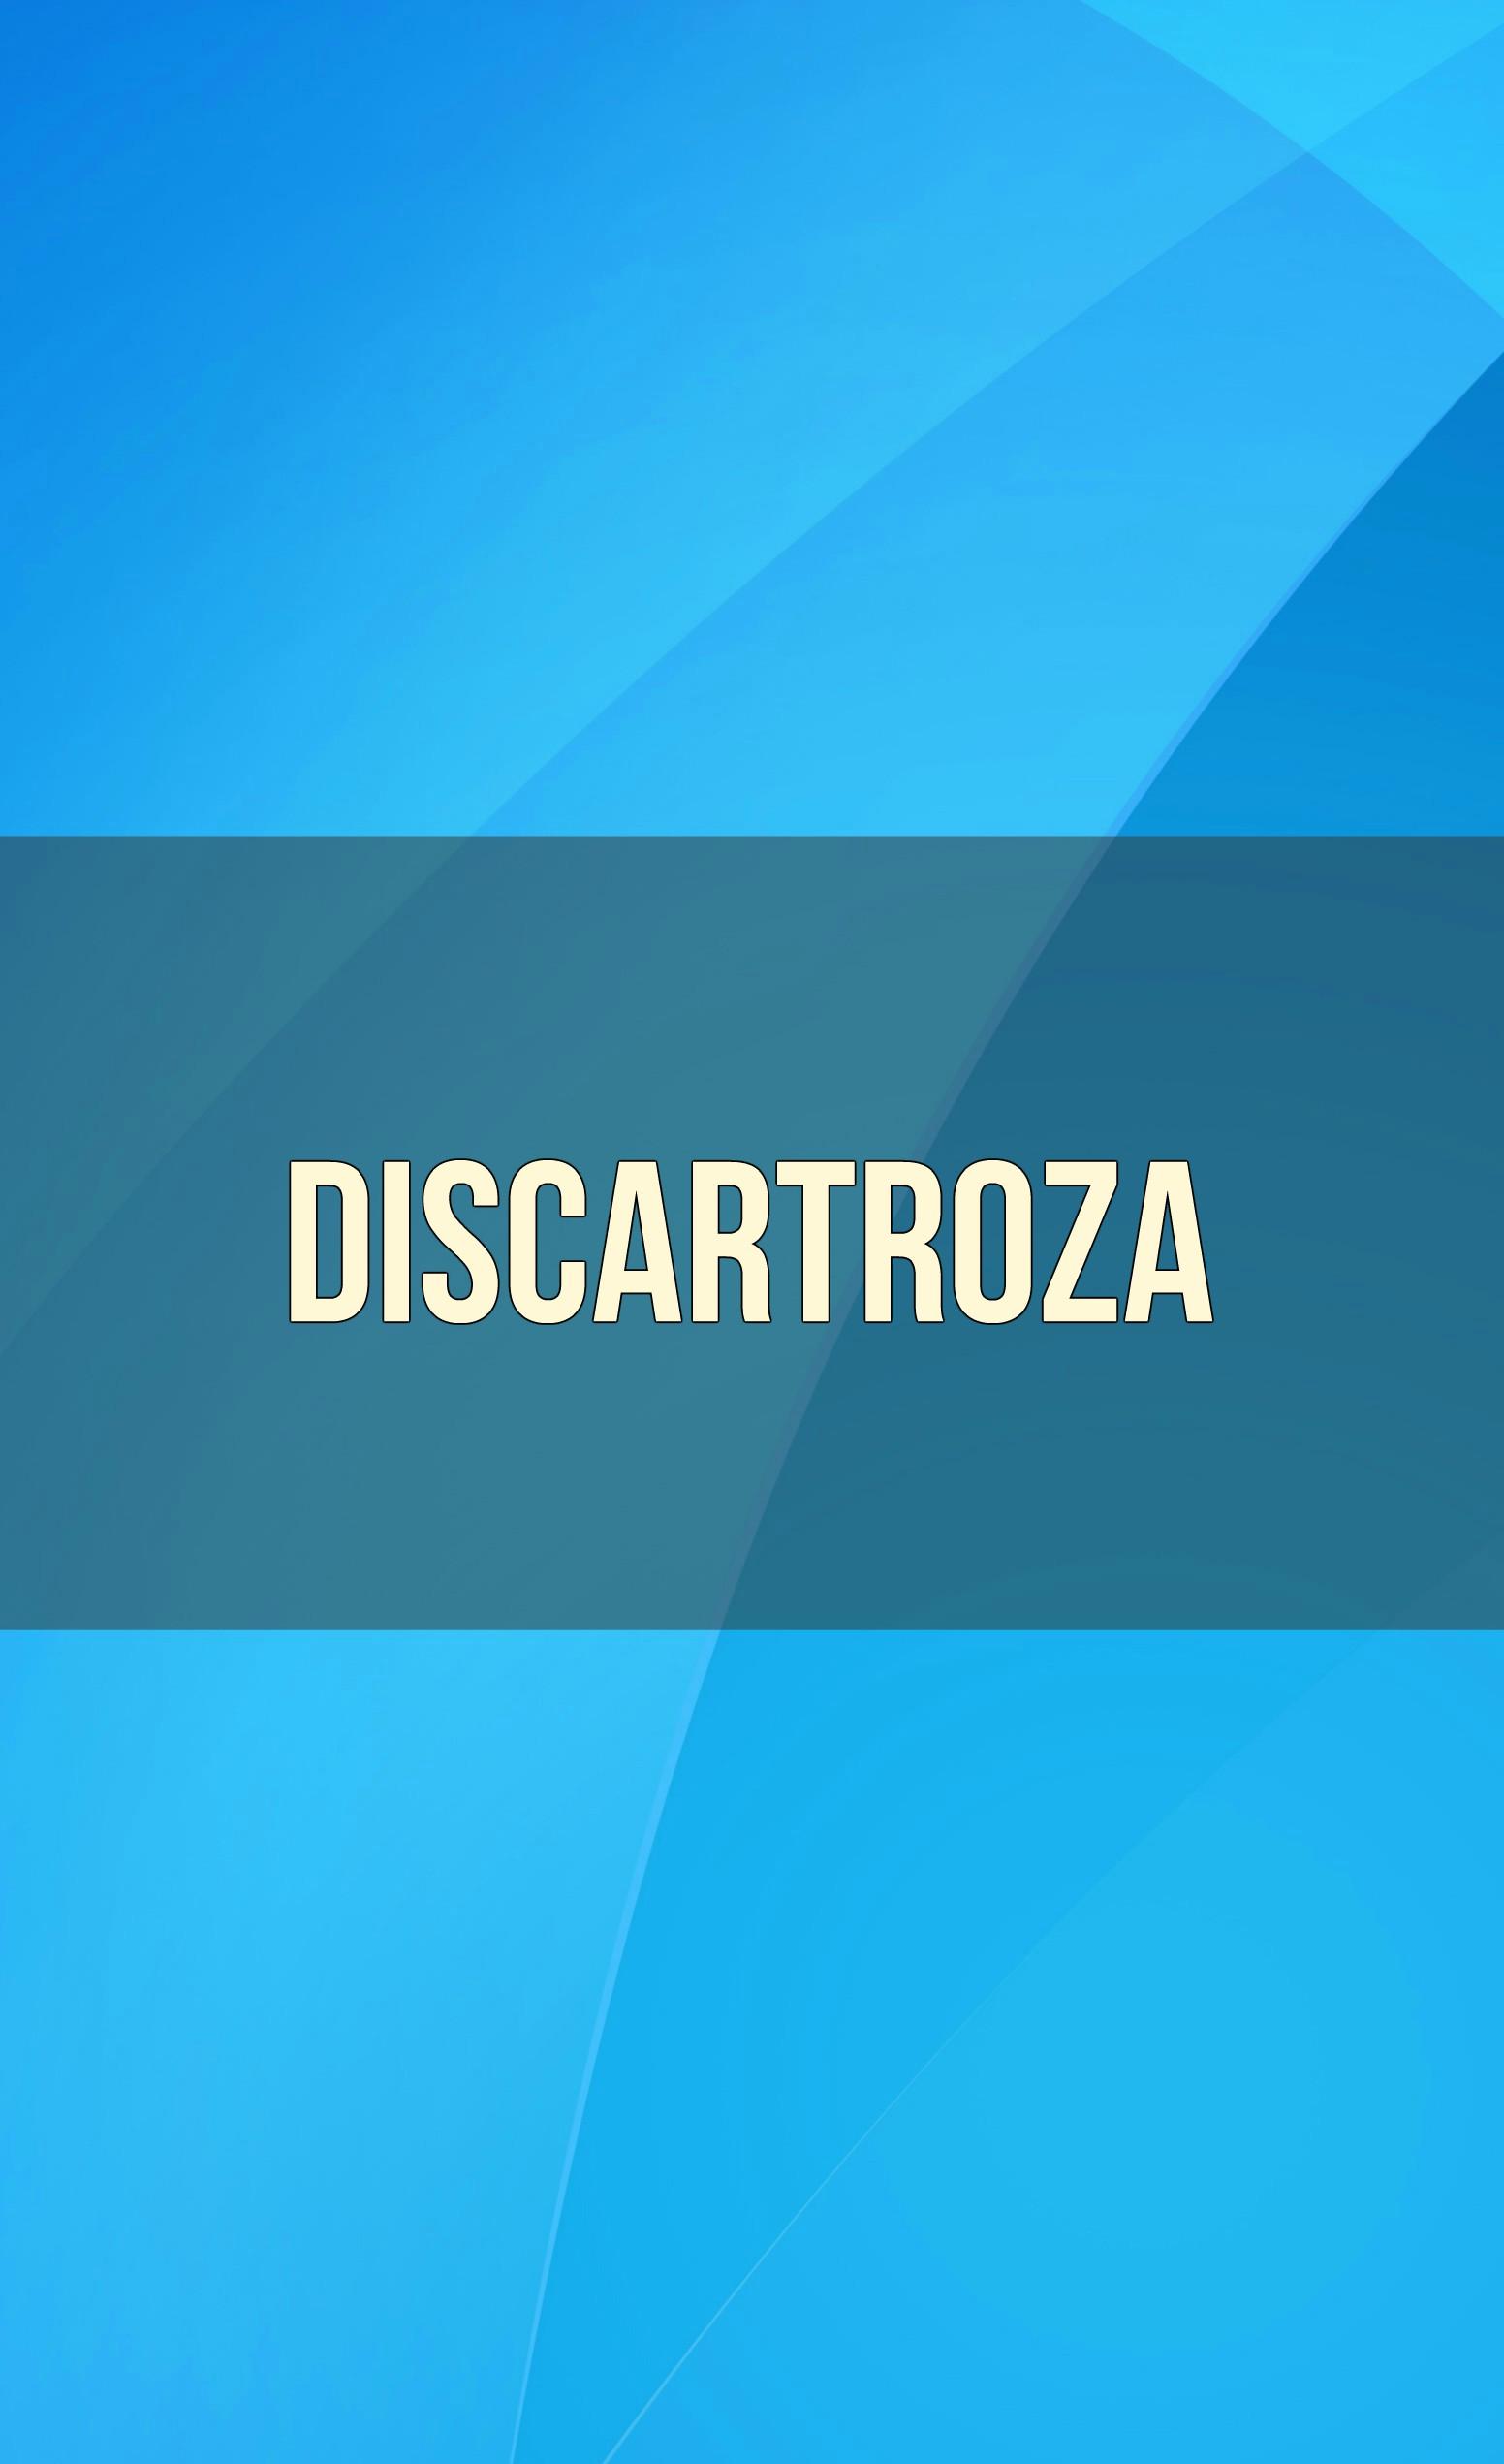 discartroza